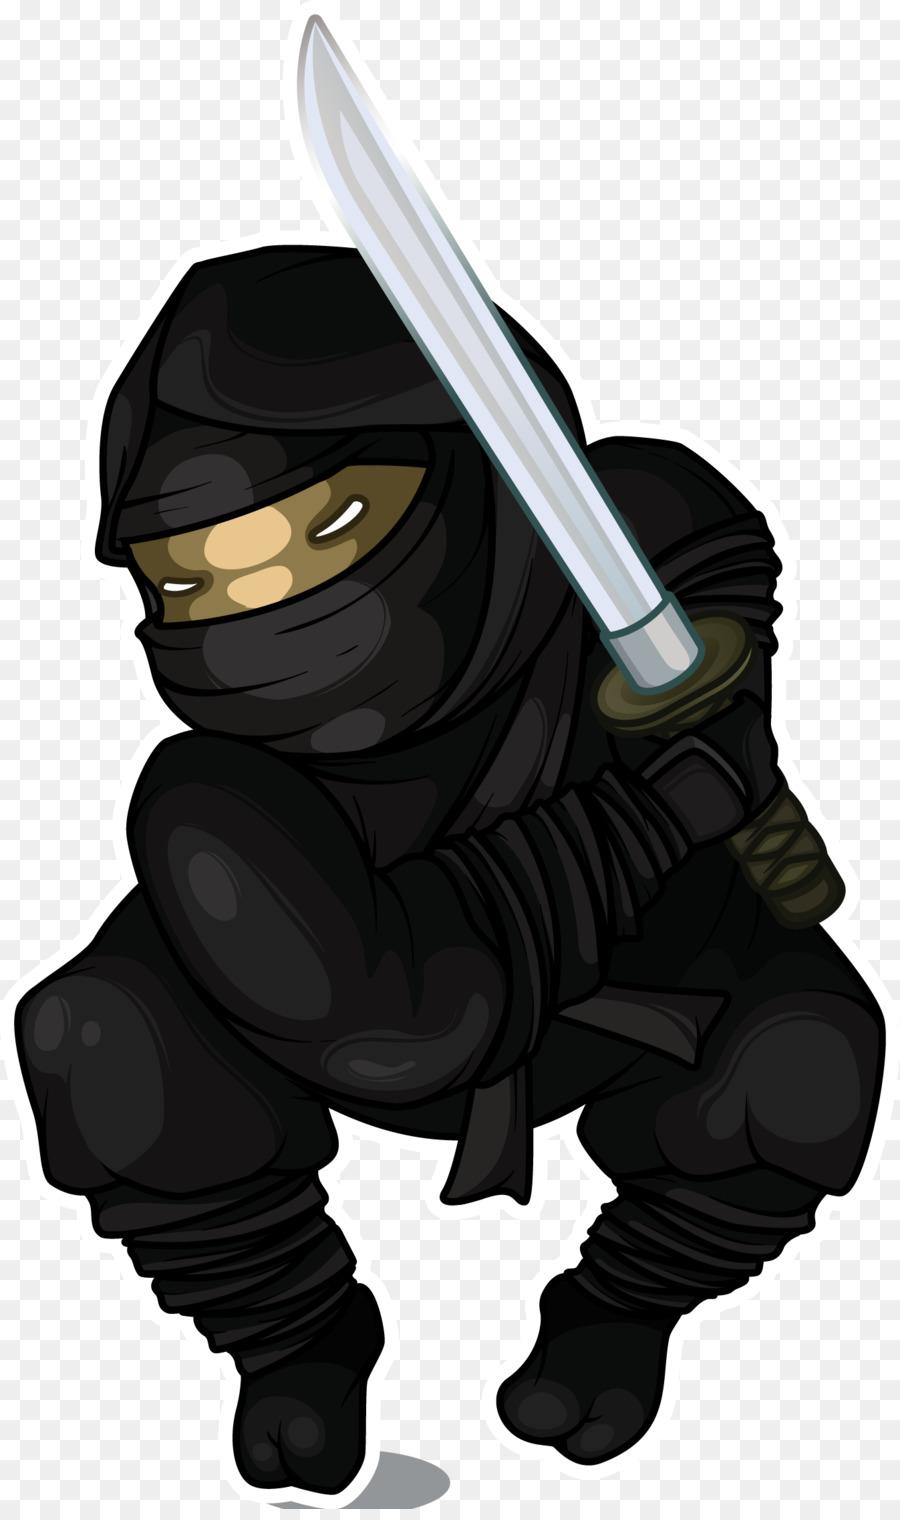 Japonés Ninja Ilustración De Dibujos Animados - Dibujos animados ...